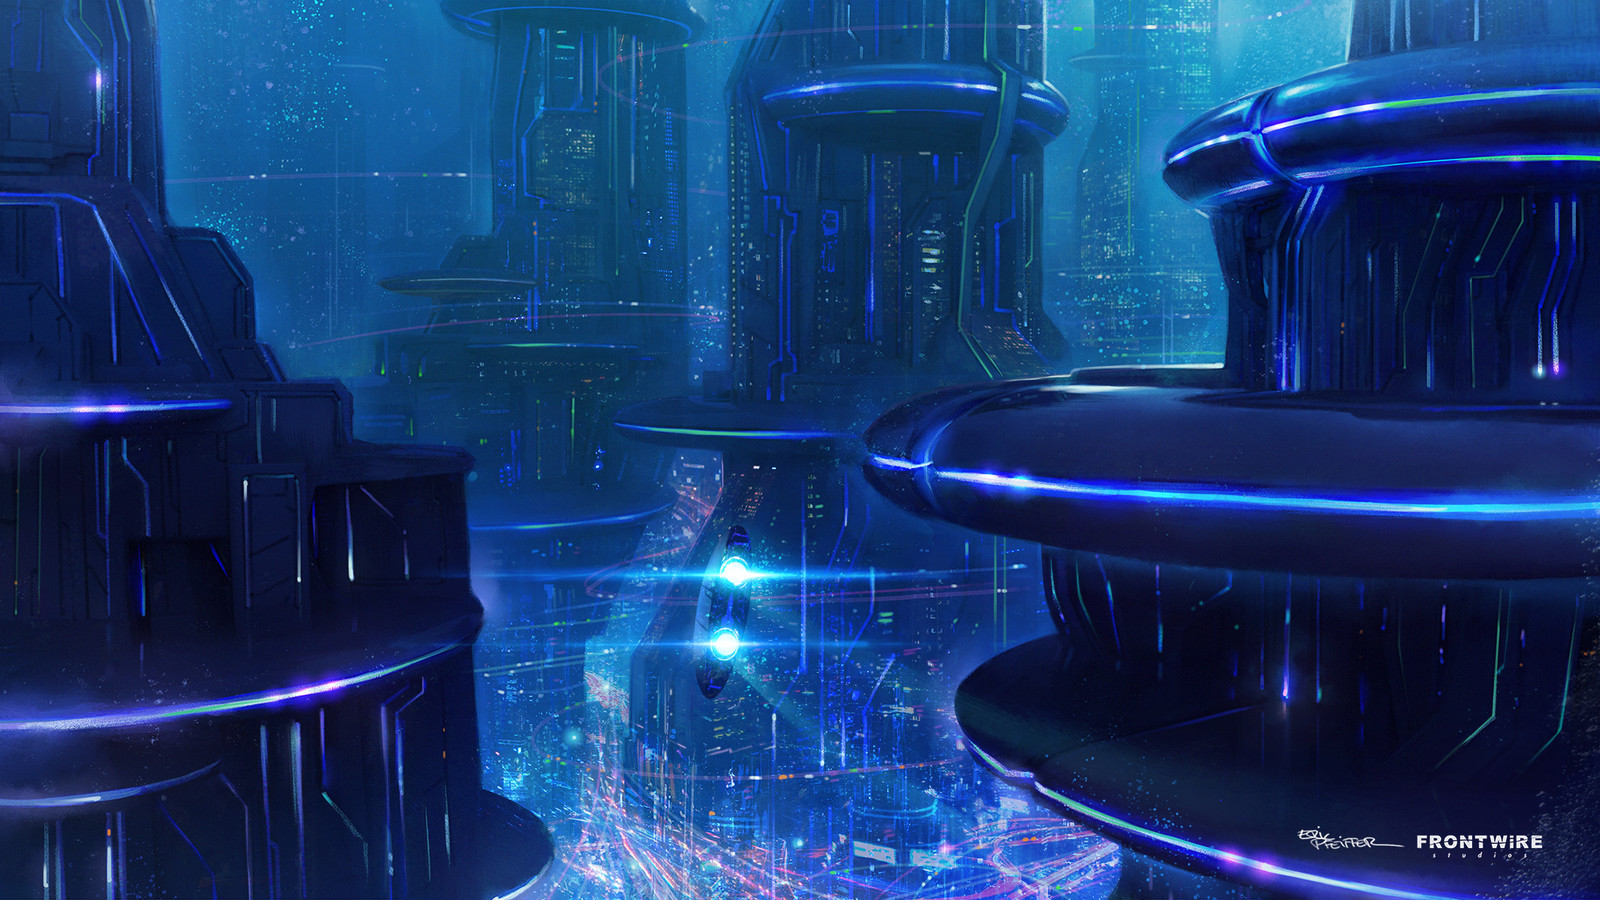 Galaxy in Turmoil Environment Concept Art